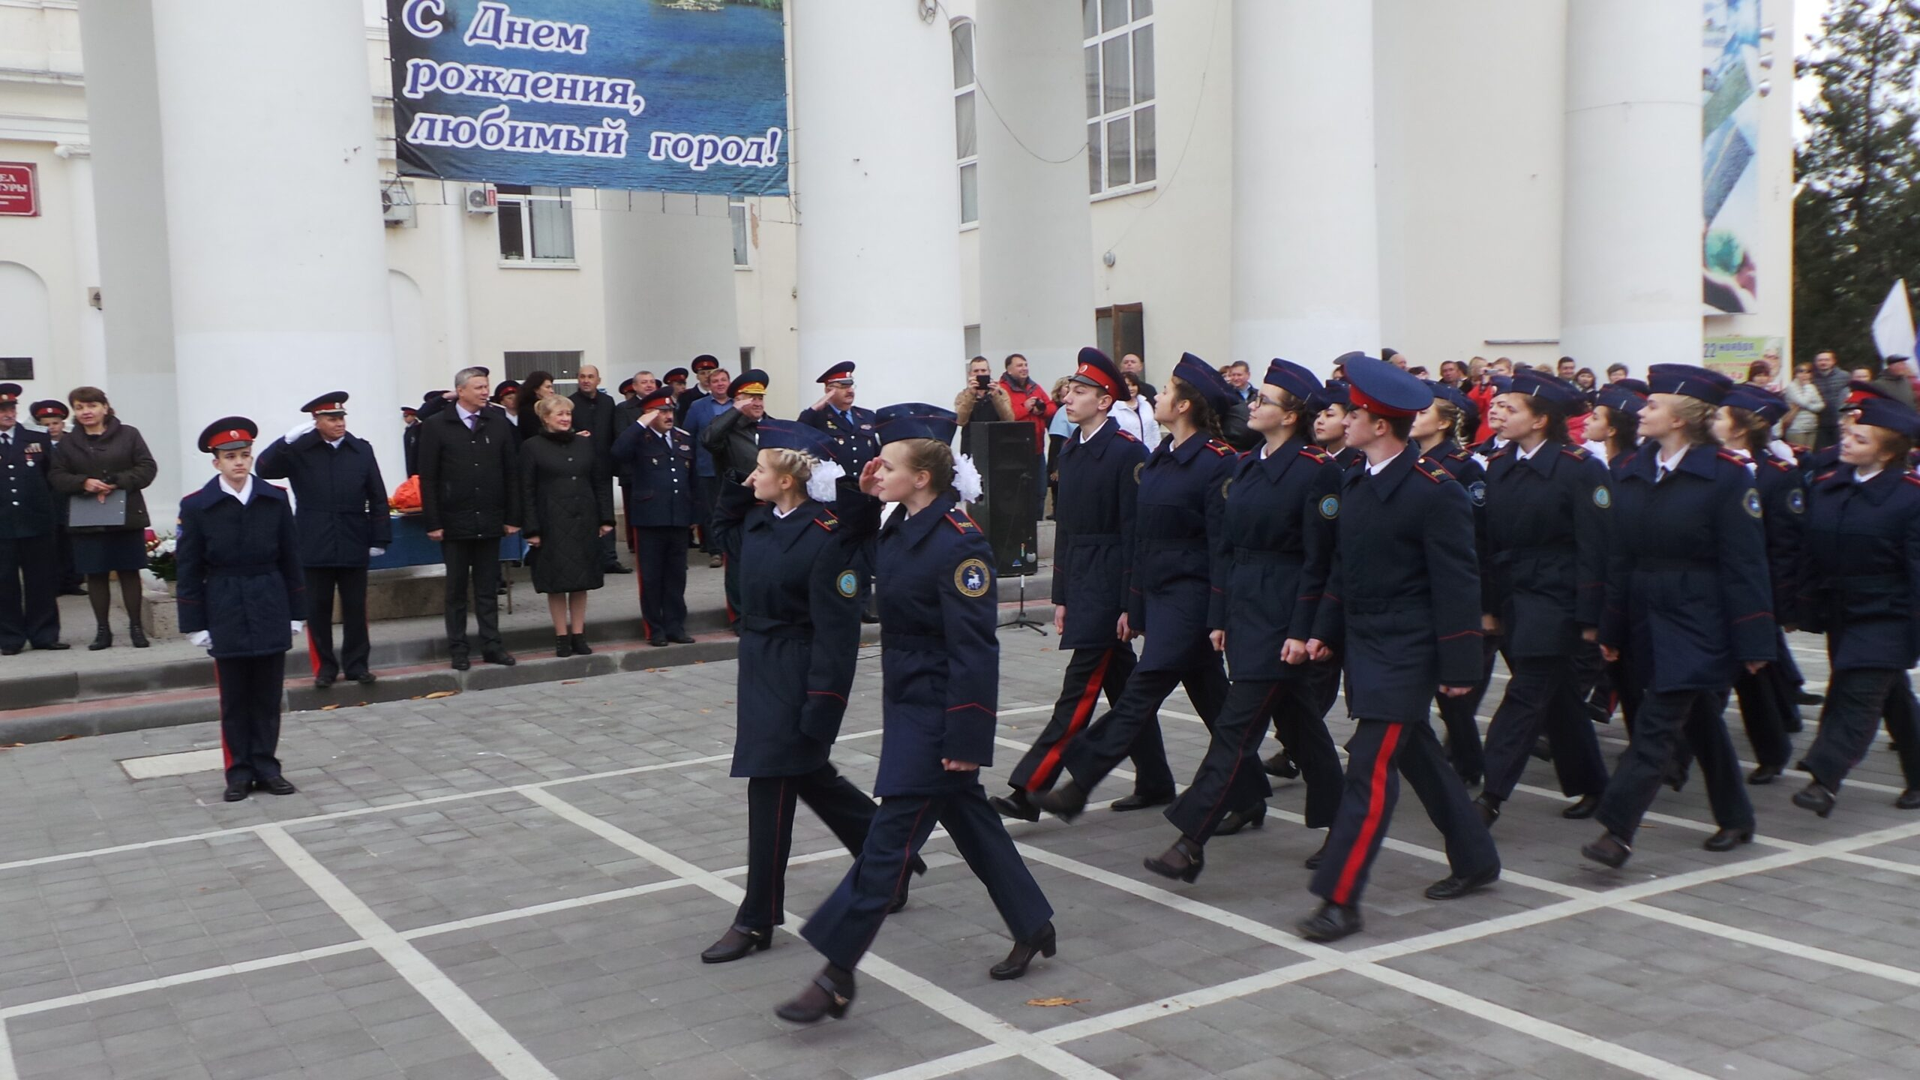 Белокалитвинскому кадетскому корпусу — 15 лет!